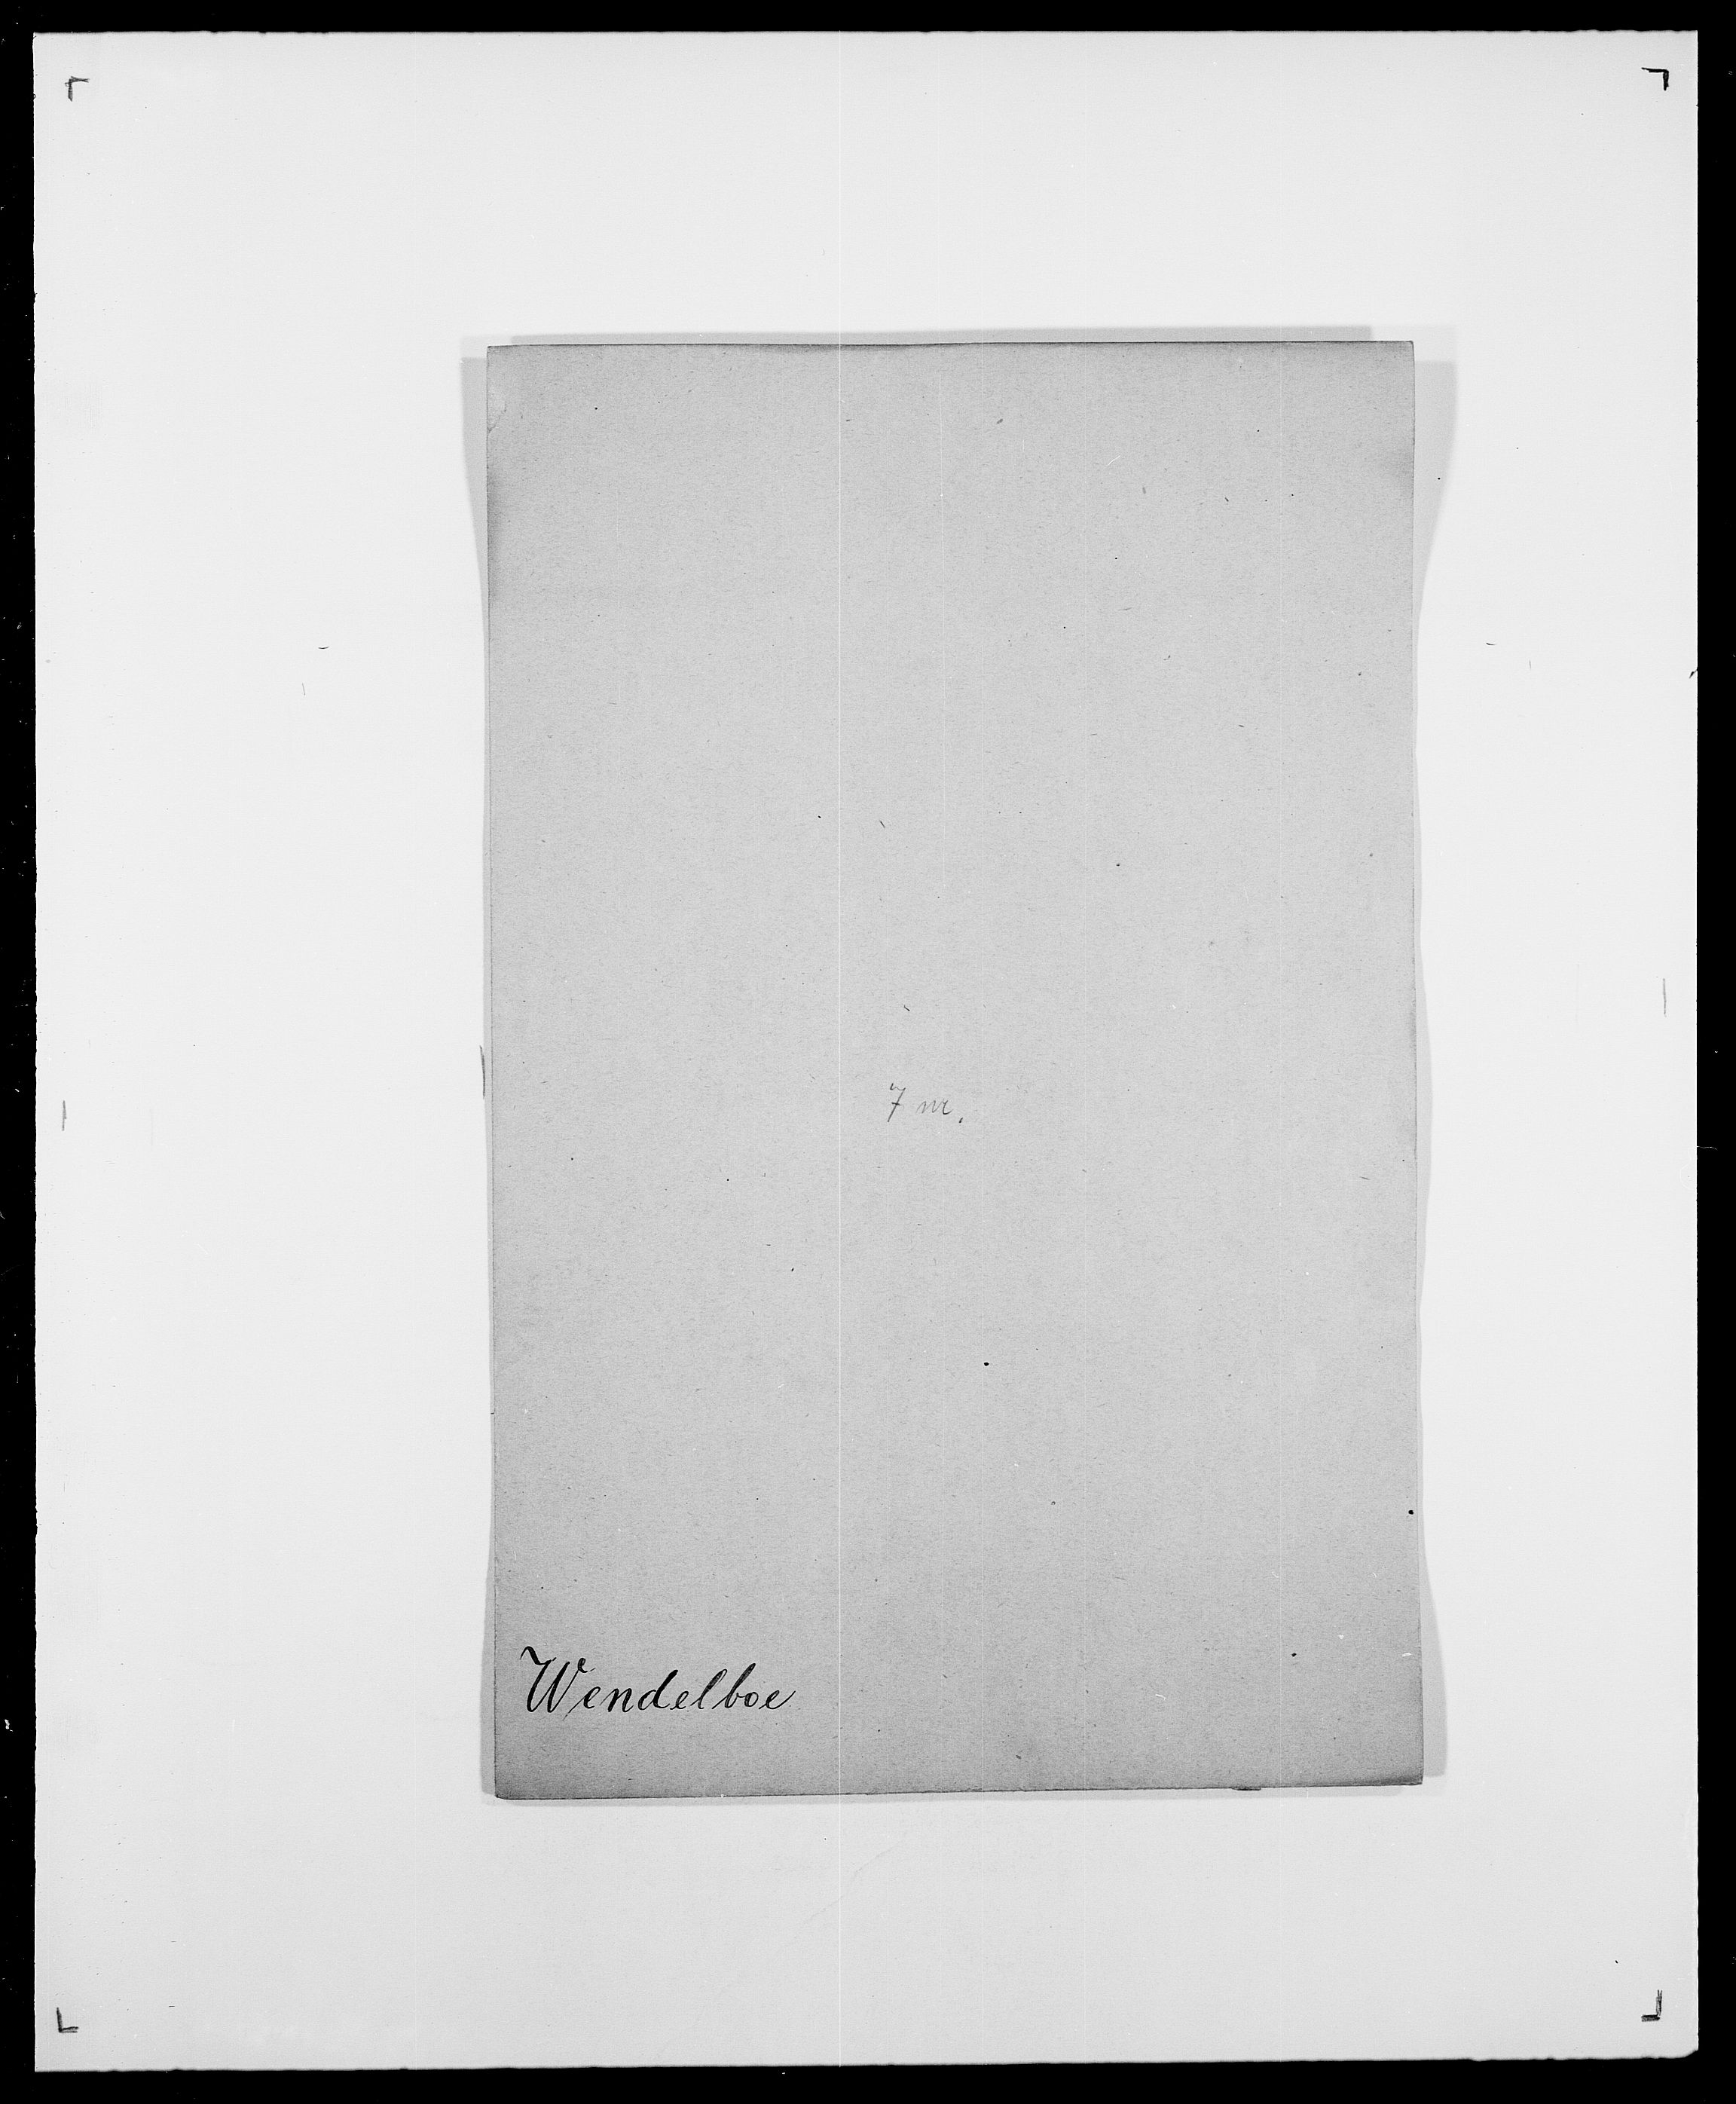 SAO, Delgobe, Charles Antoine - samling, D/Da/L0041: Vemmestad - Viker, s. 12